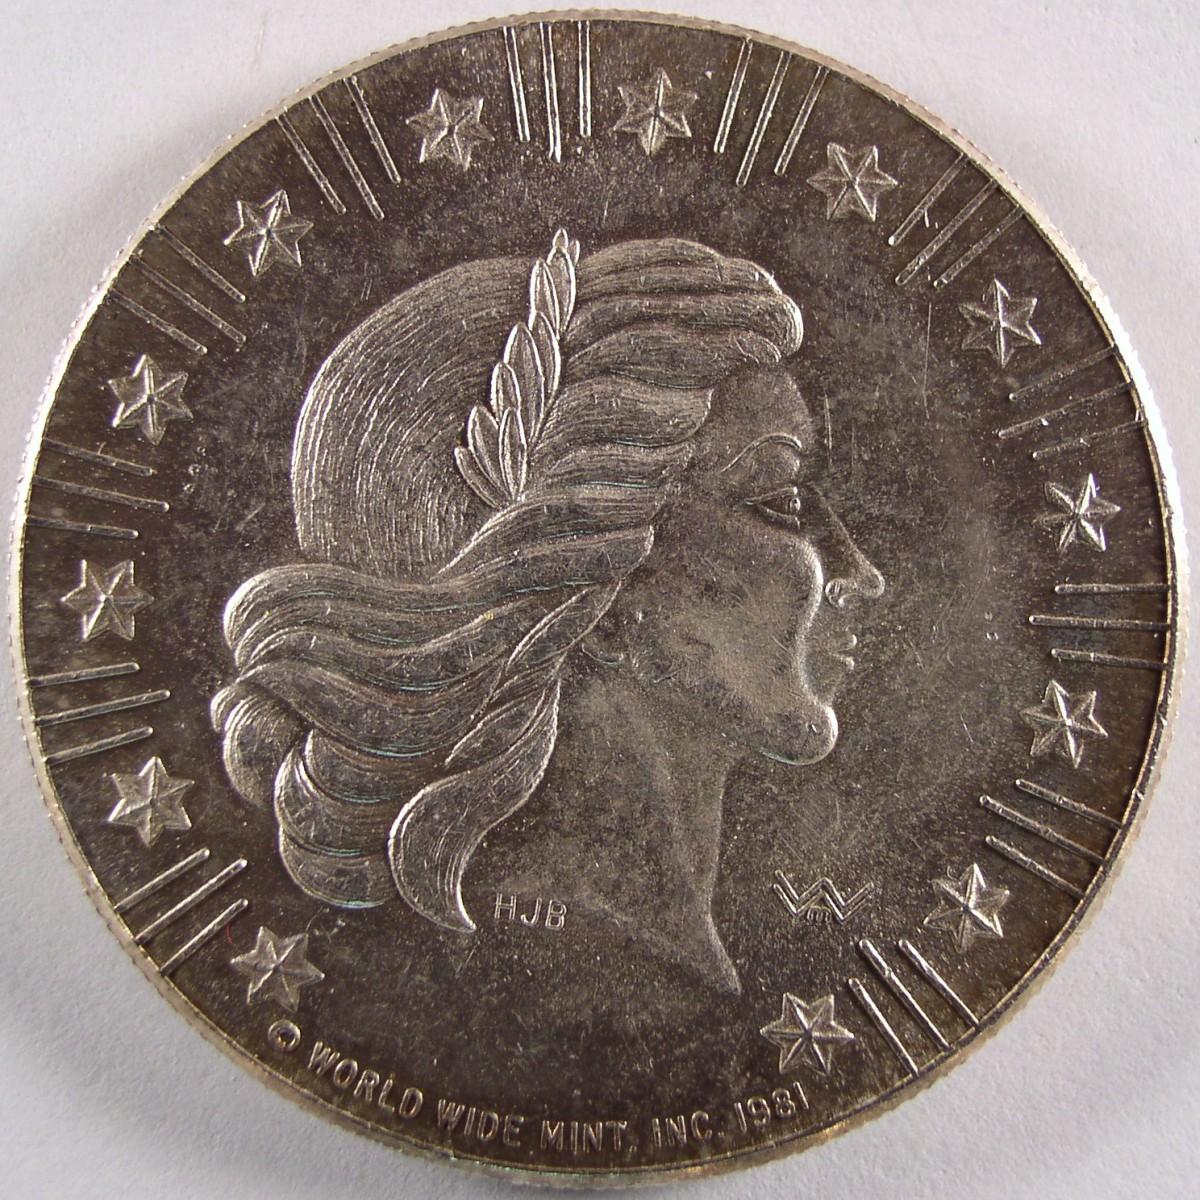 1981 American Eagle Silver Coin American Eagle Silver Dollar